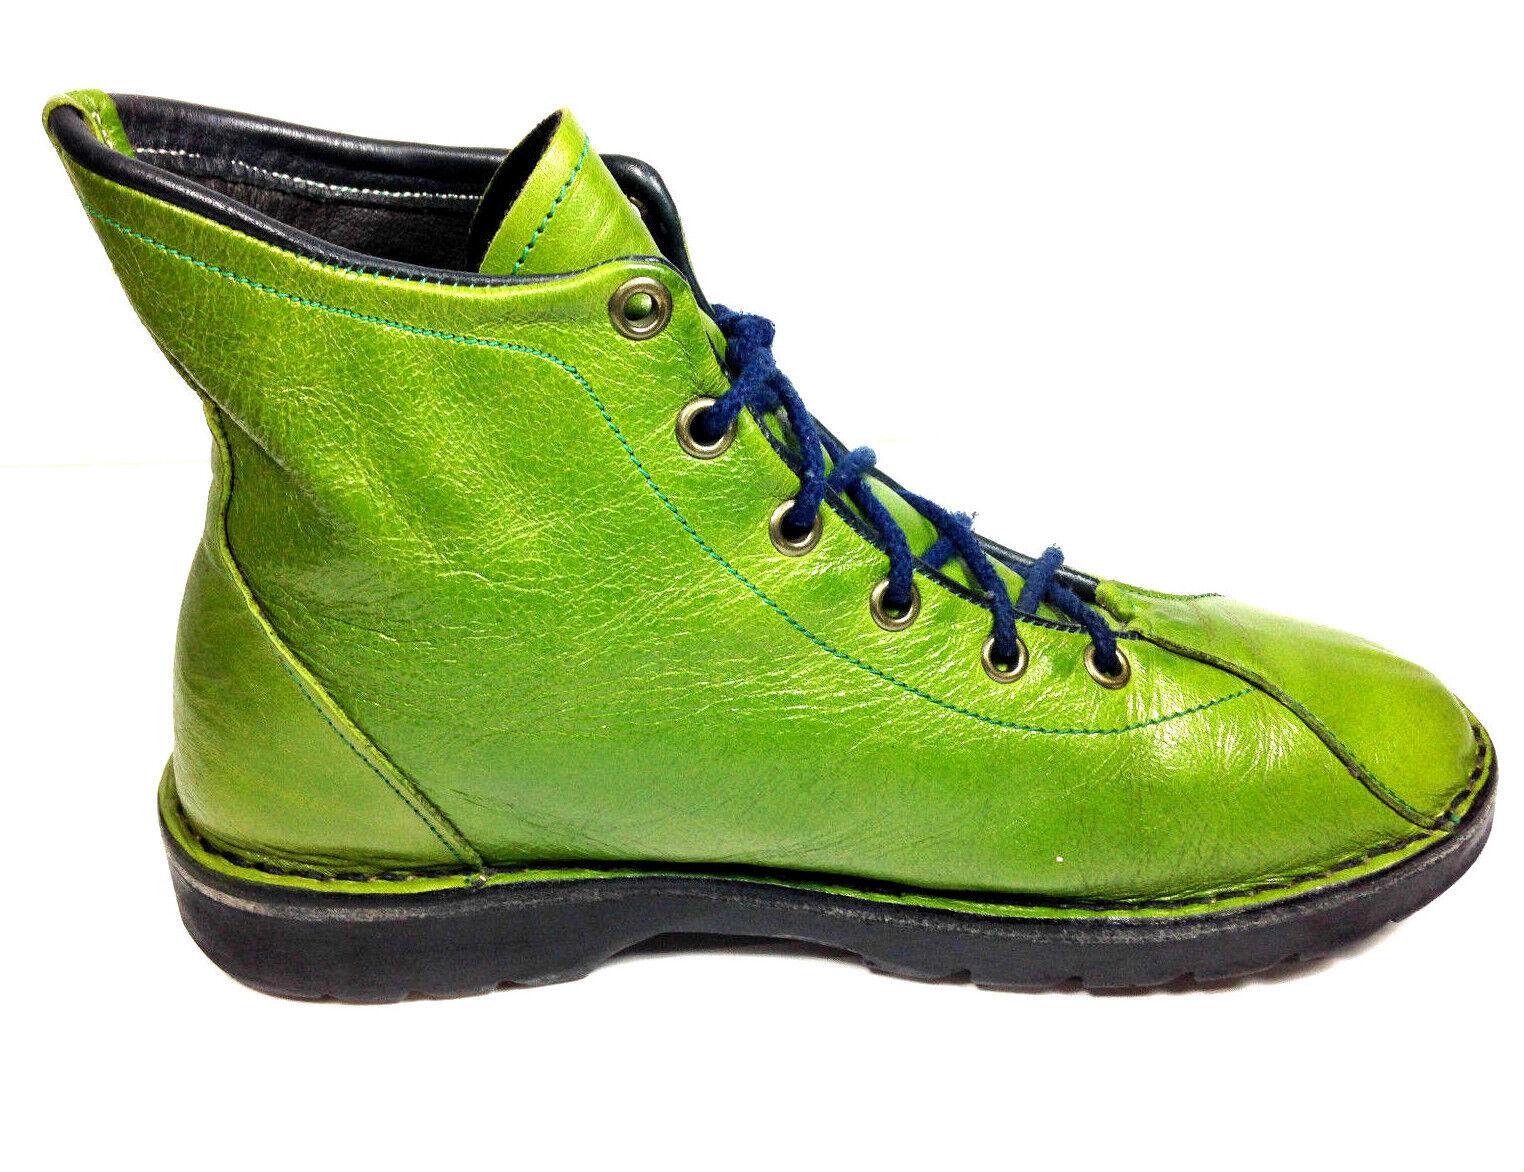 Vintage Arlidge & Bowen Women's Ankle Boot Green EUR.38 US.7.5